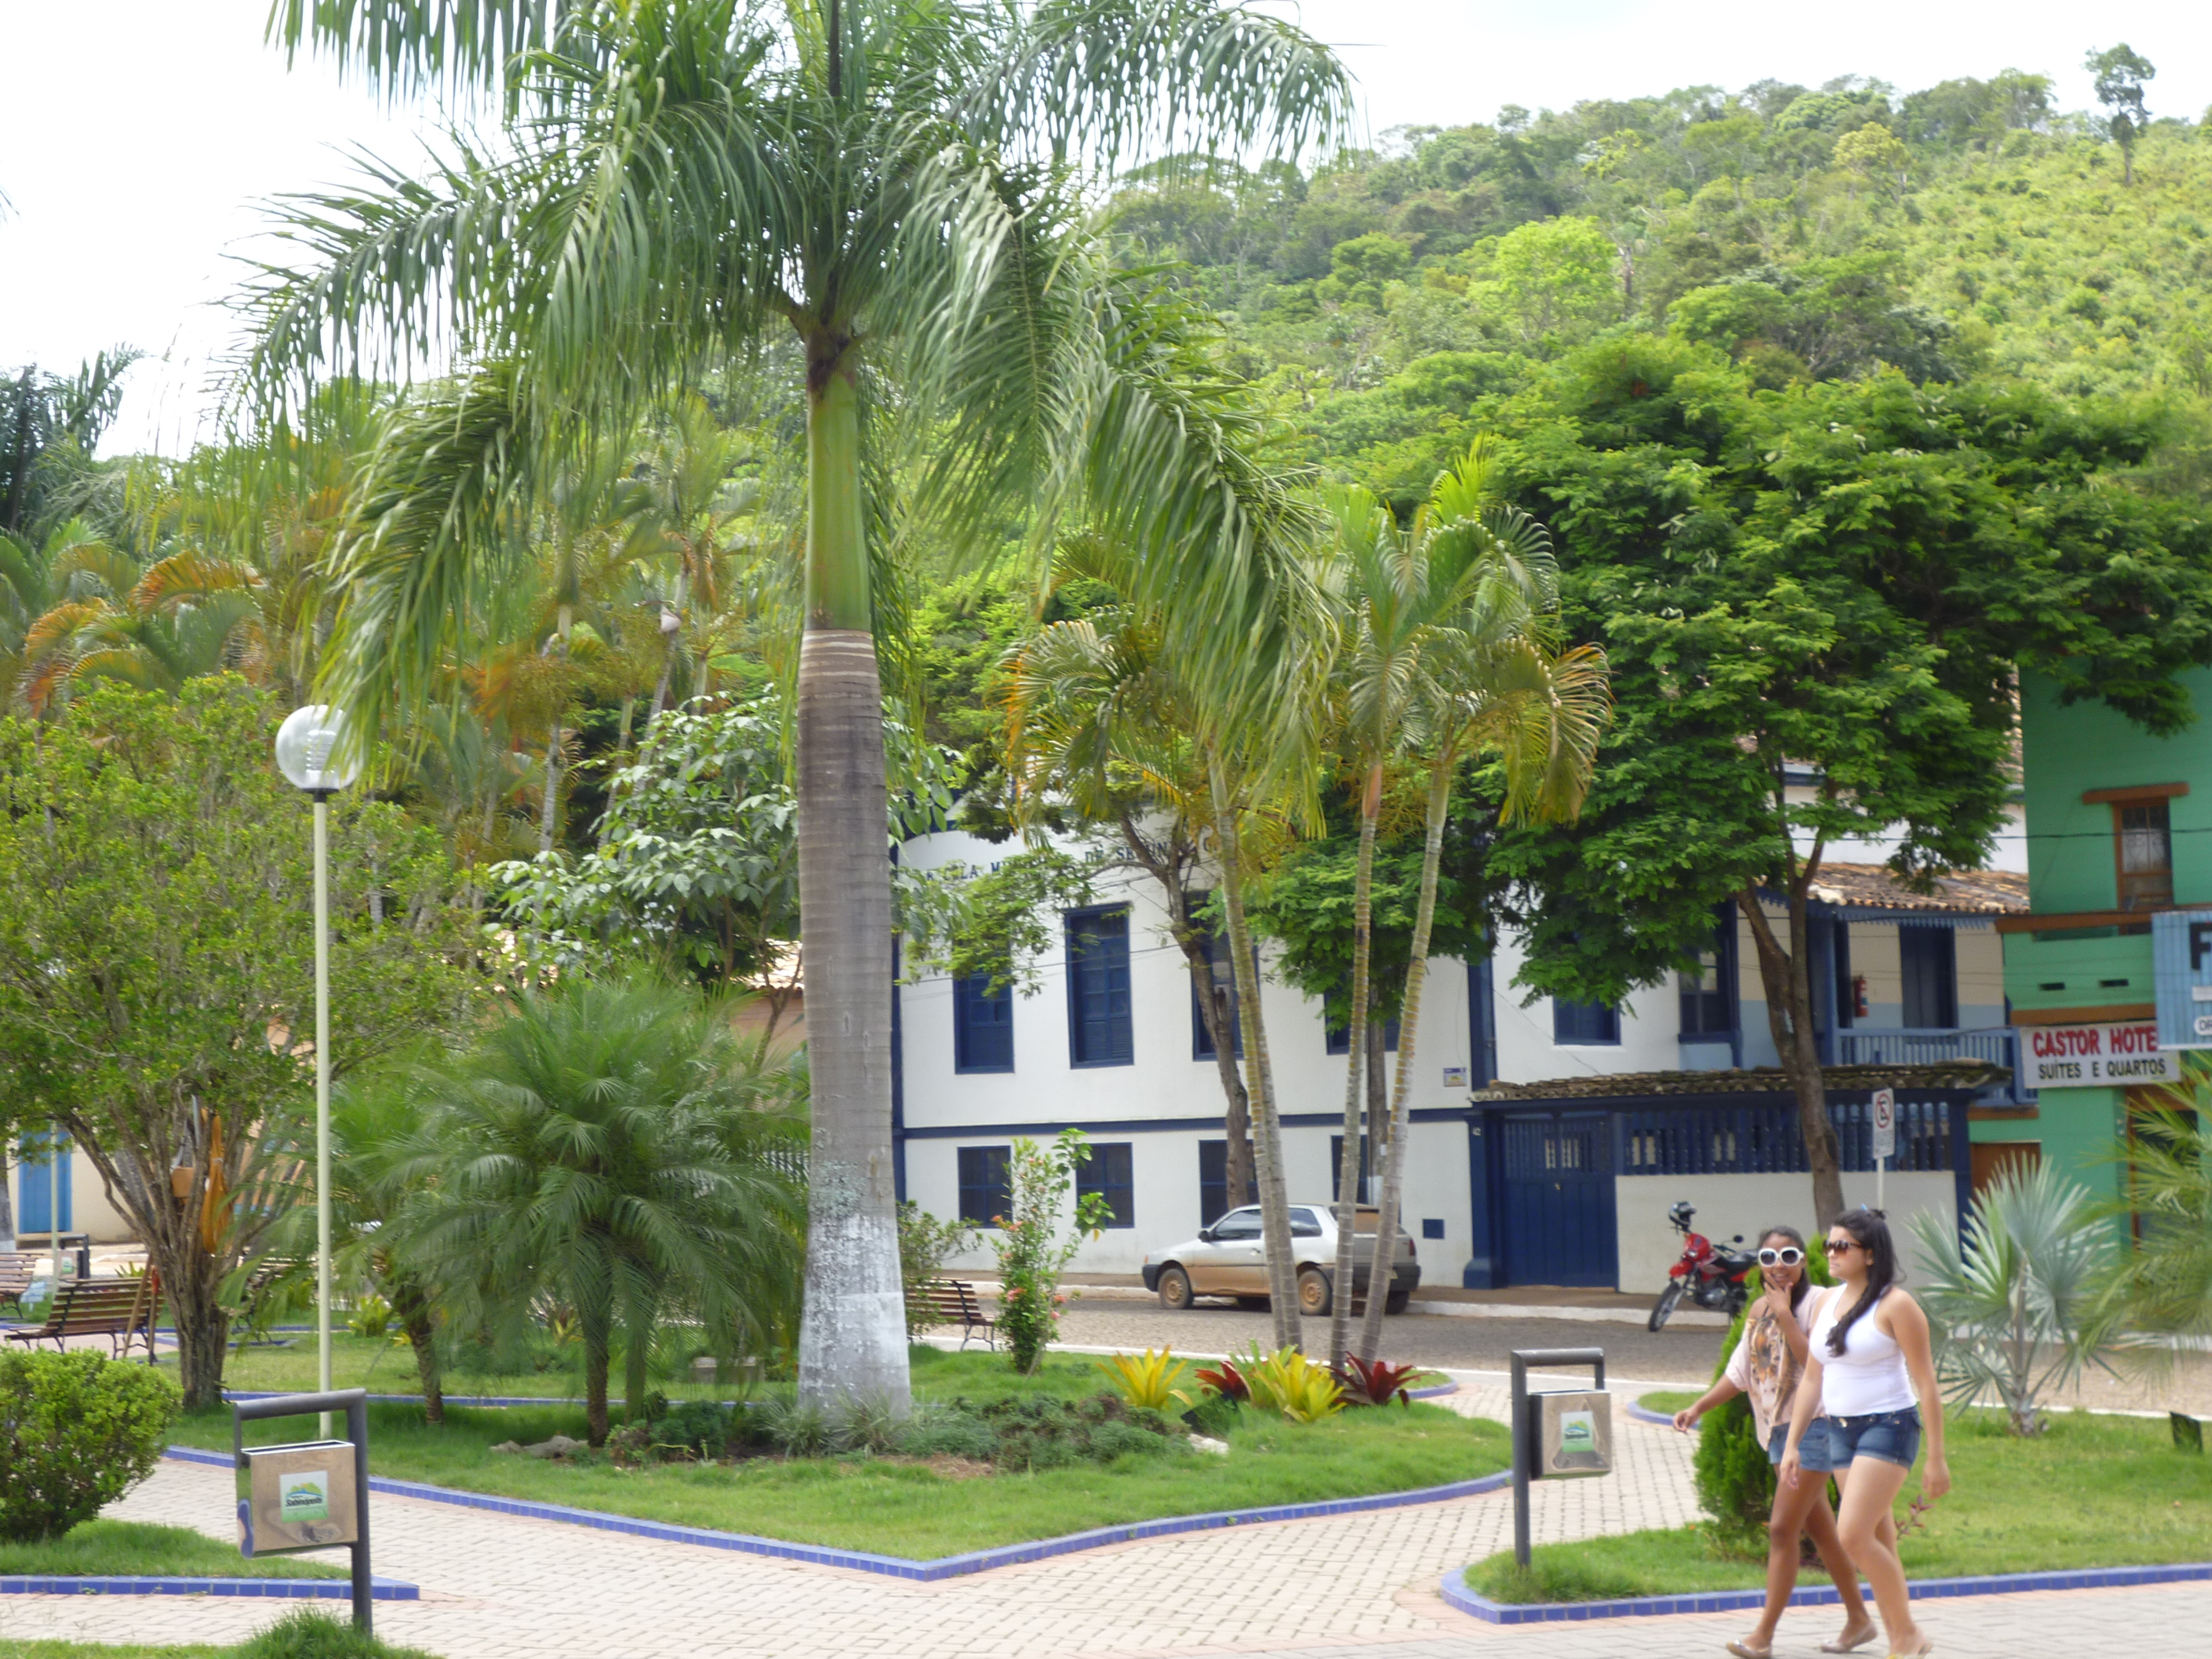 Sabinópolis Minas Gerais fonte: upload.wikimedia.org